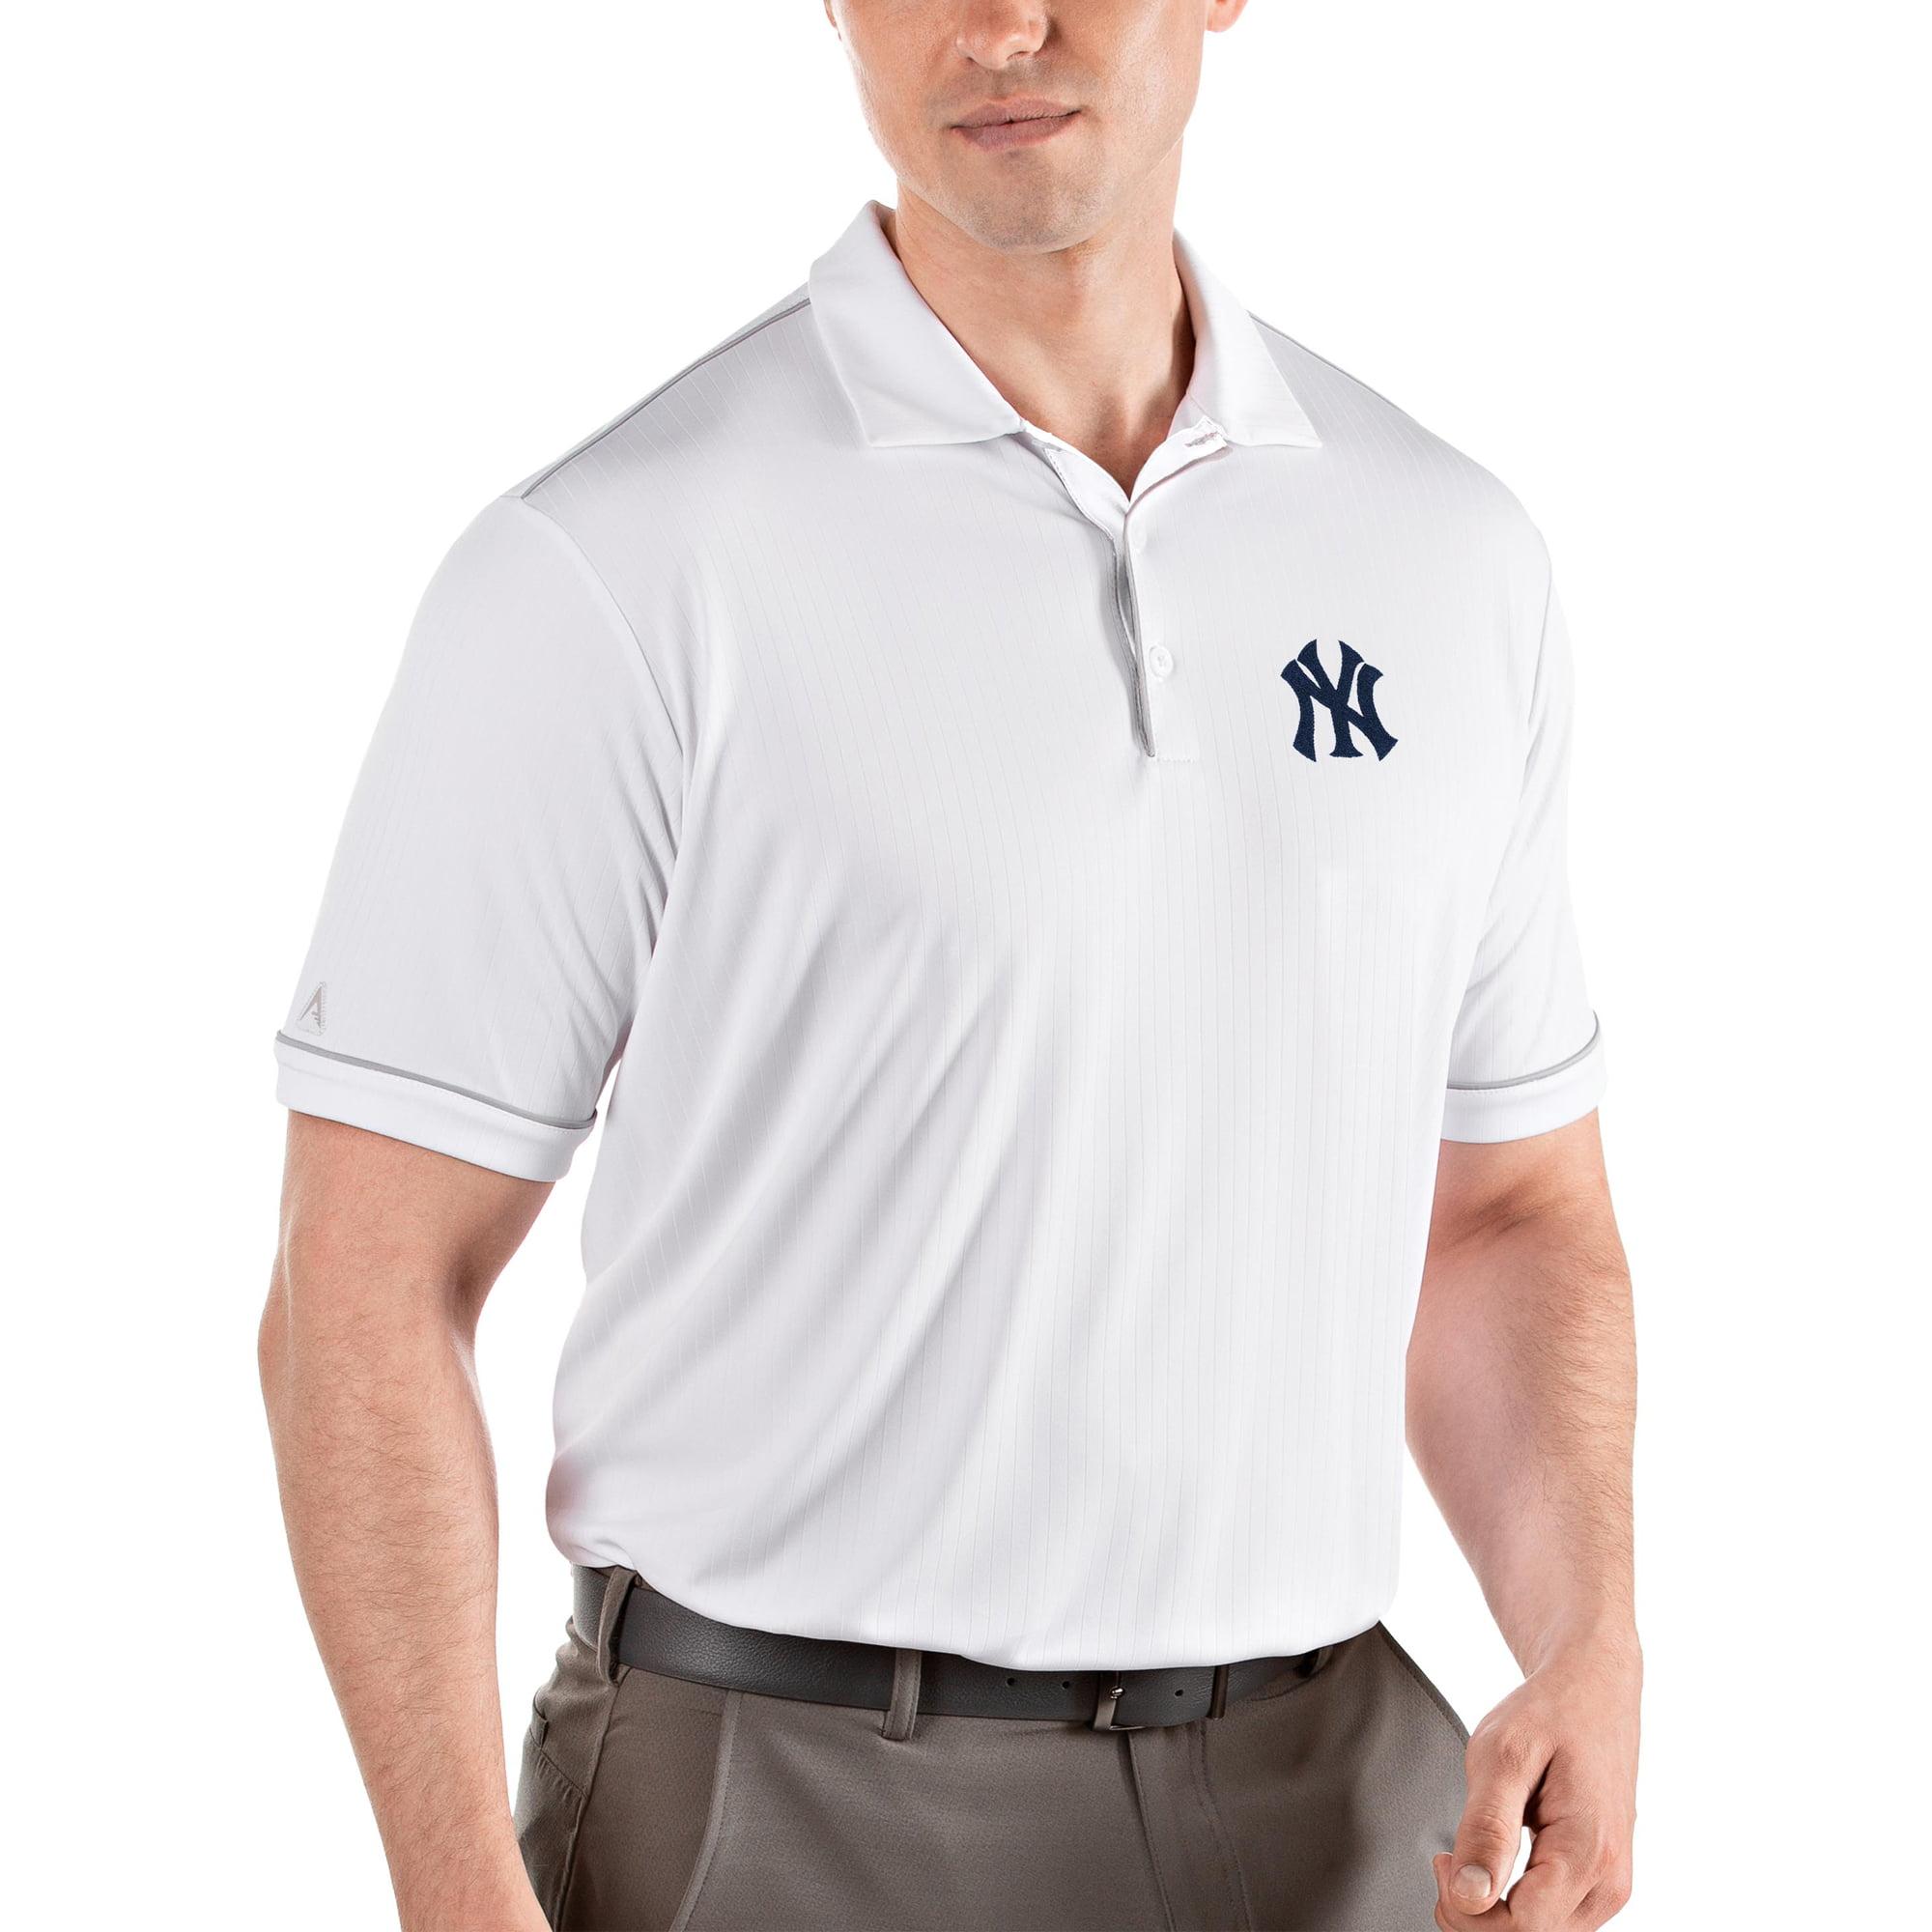 New York Yankees Antigua Salute Polo - White/Gray